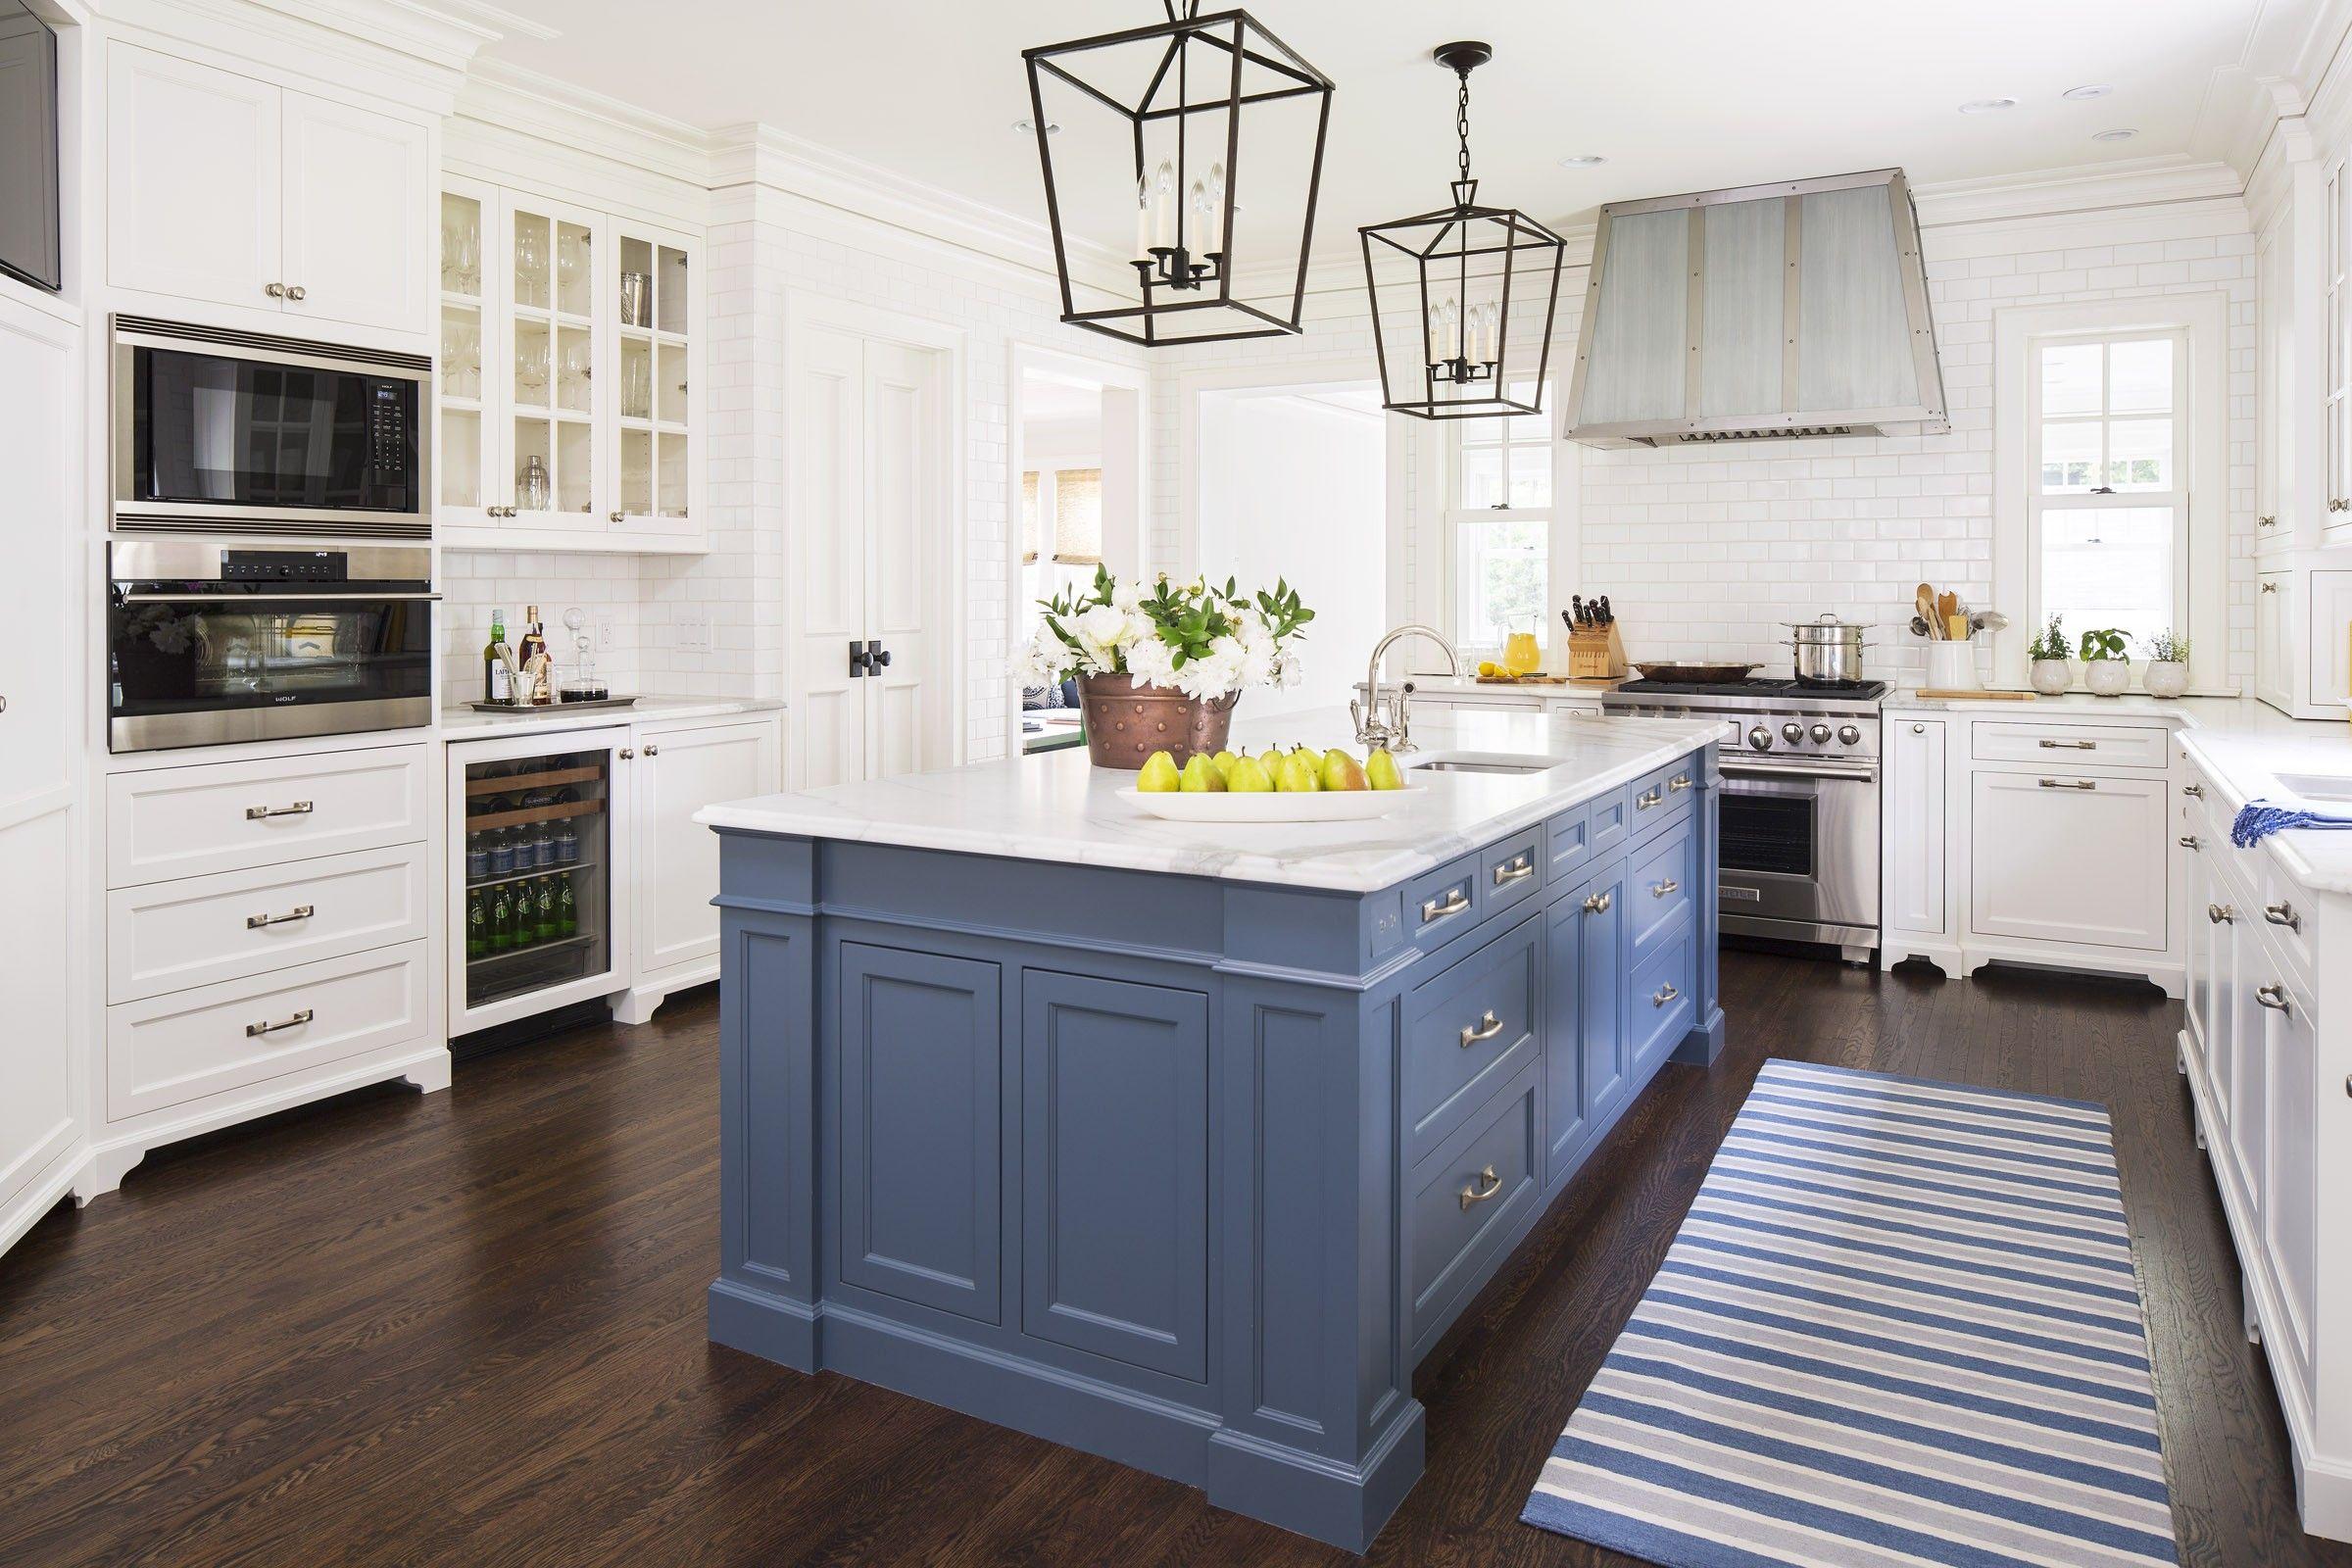 Download Wallpaper Blue White Marble Kitchen Countertops